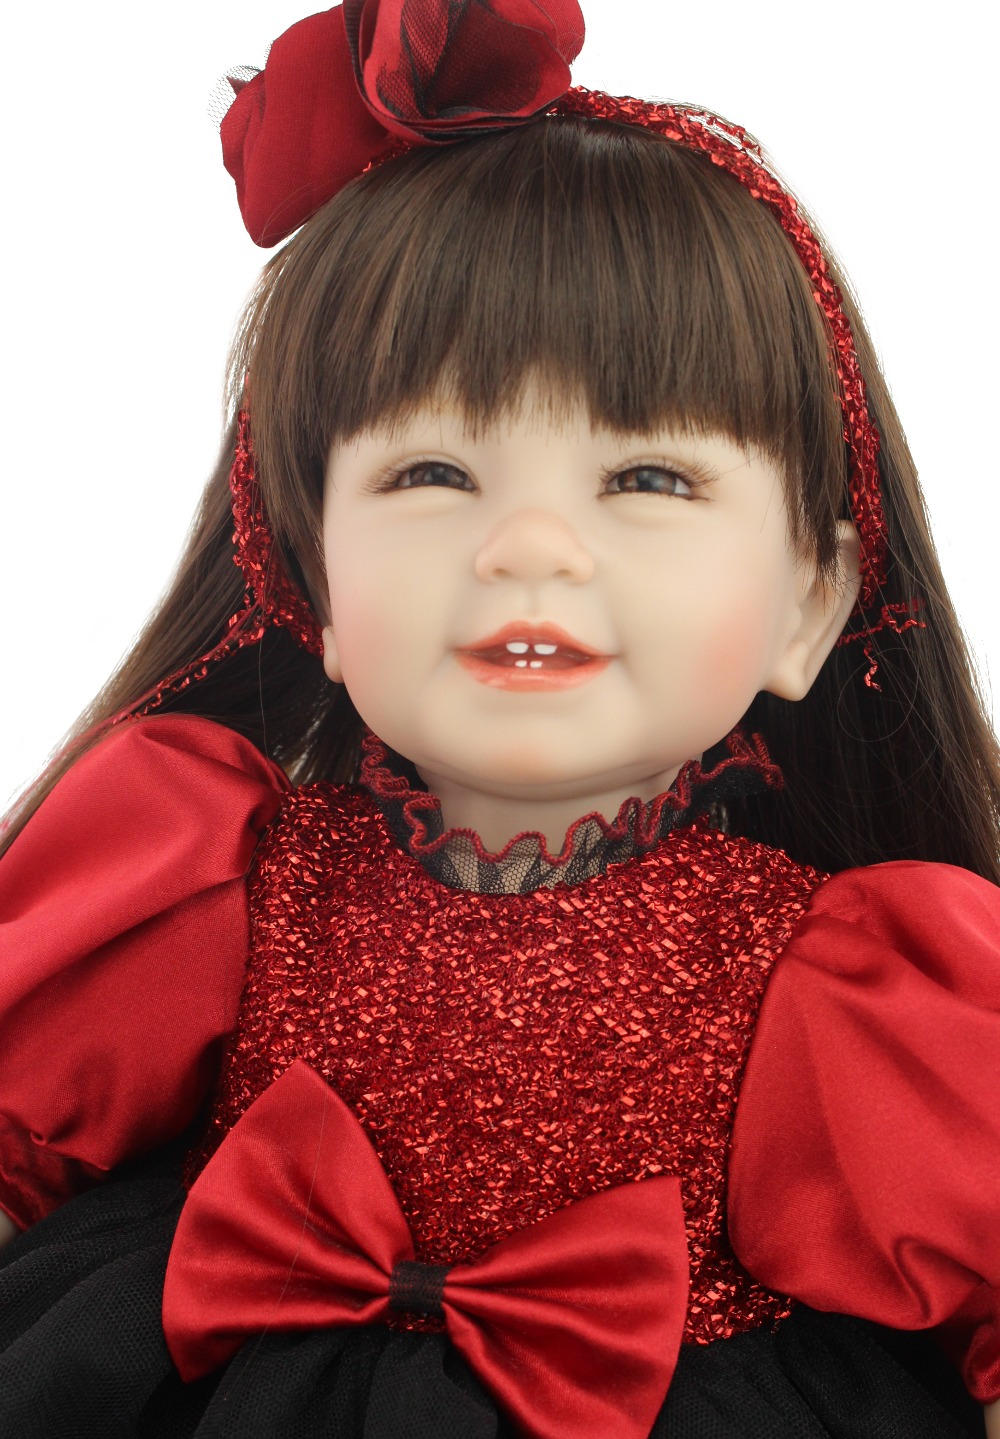 2015 NEW design hot sale lifelike reborn todder girl doll wholesale baby dolls fashion doll Christmas